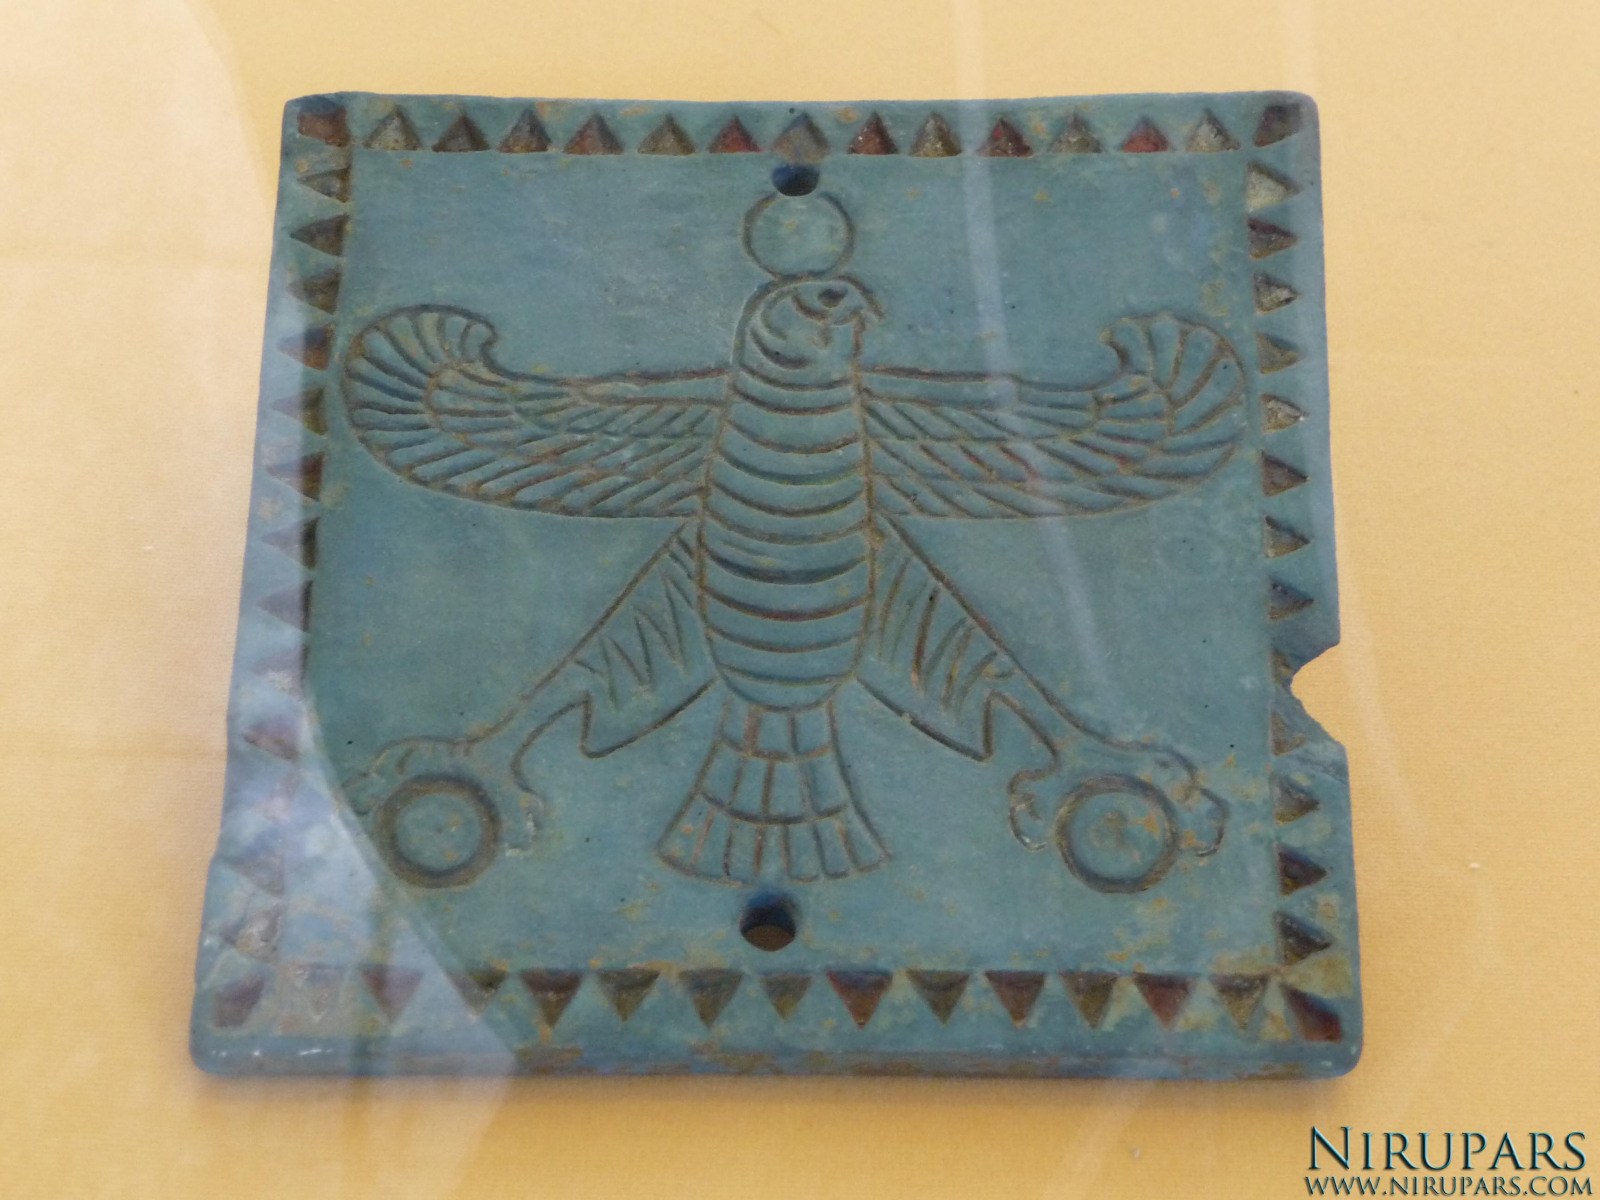 National Museum of Iran - Old-Persian Emblem